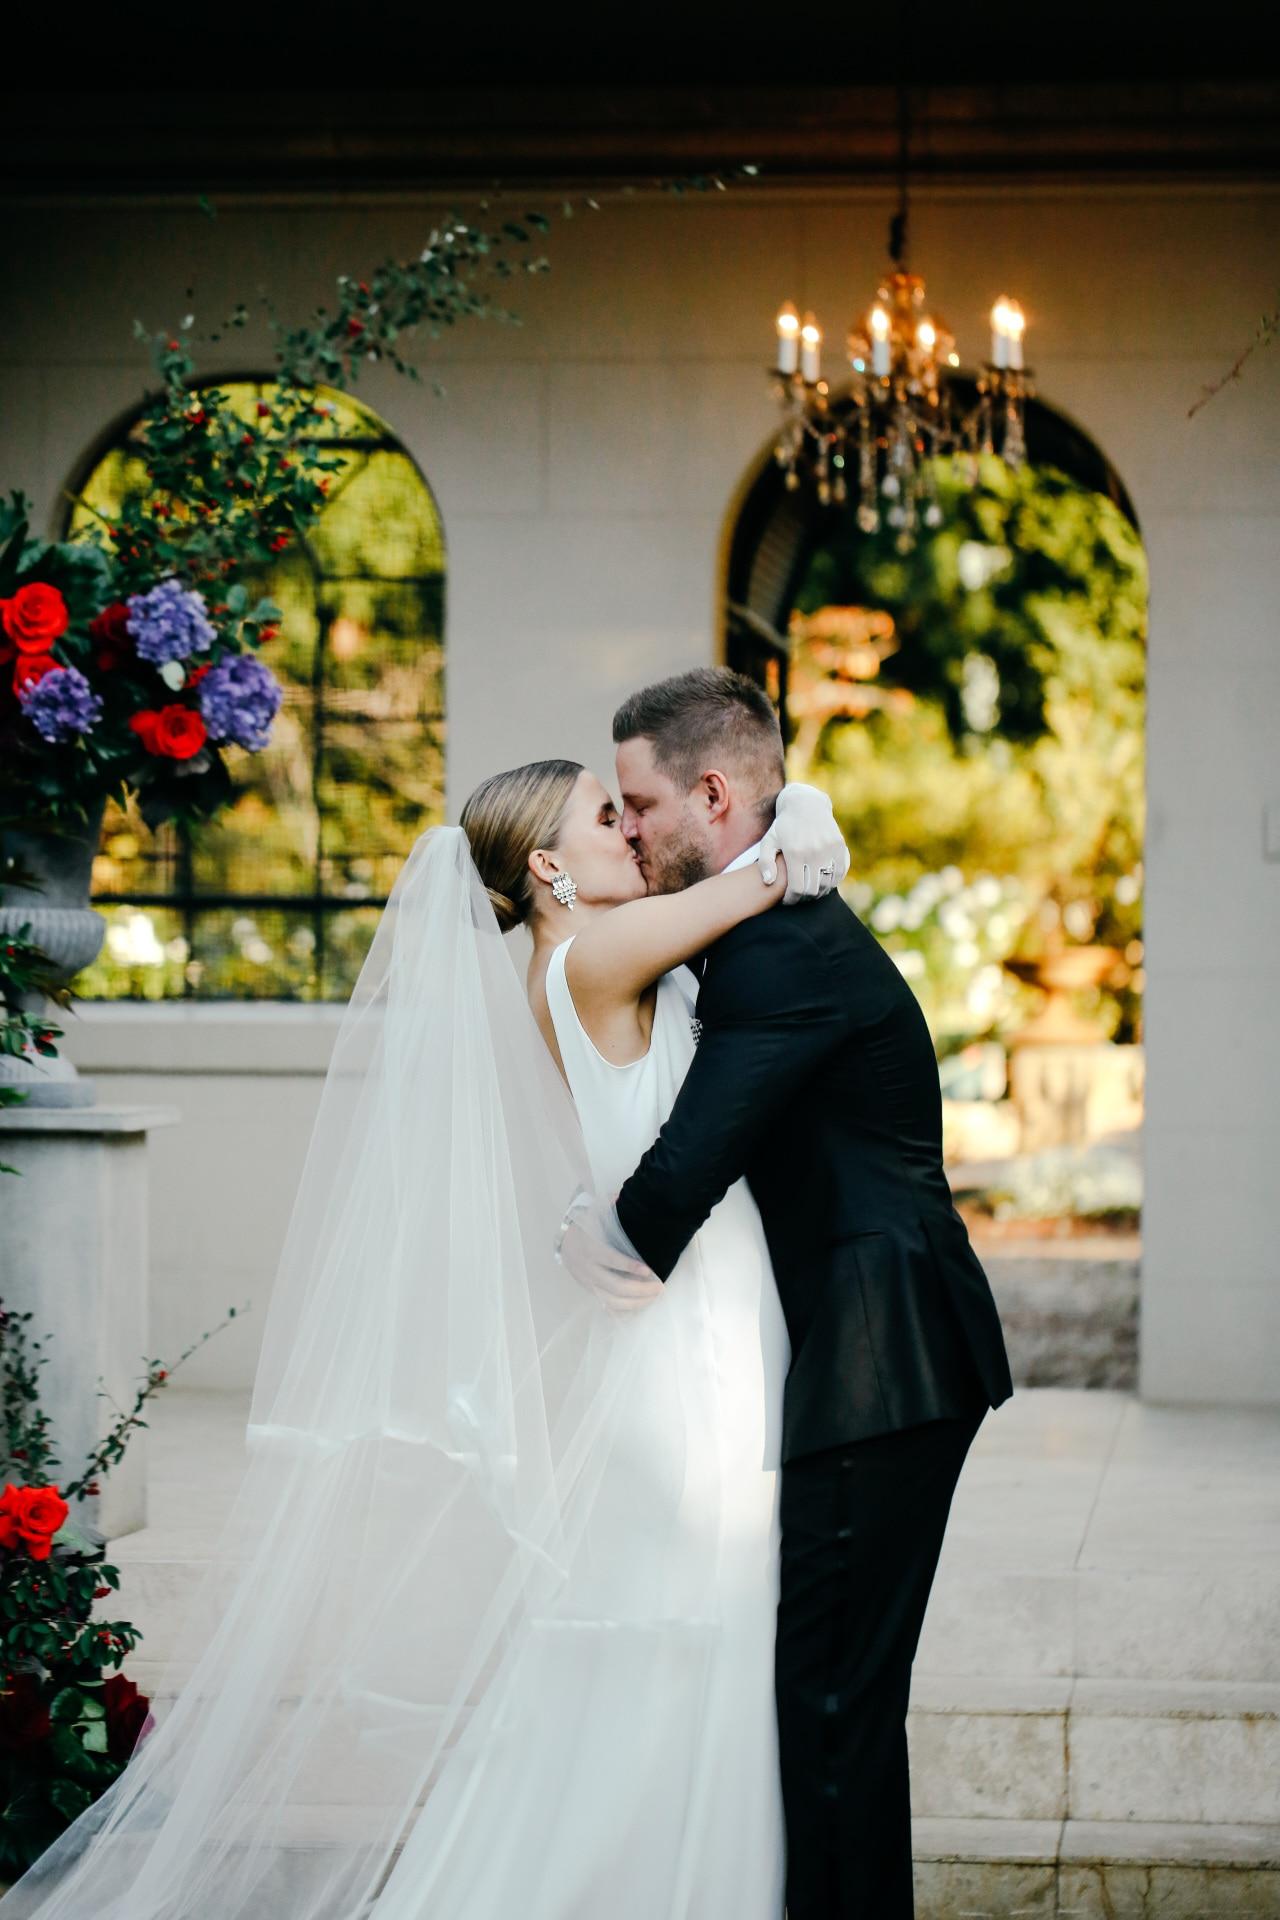 Inside a stylish Italy-inspired wedding